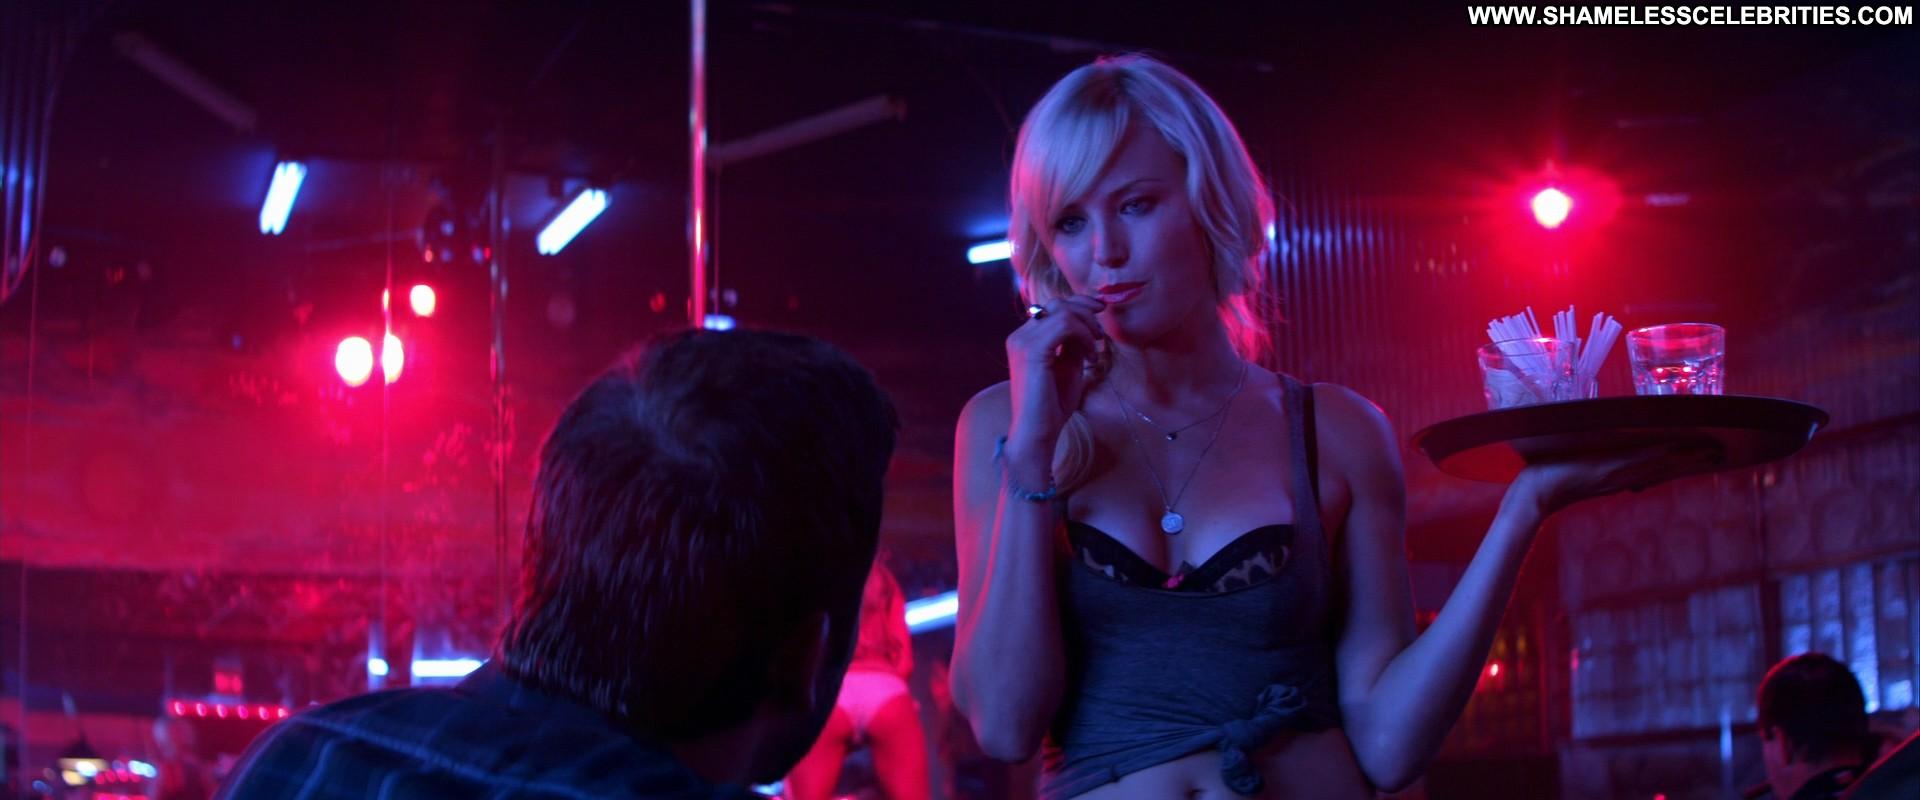 Malin Akerman Catch 44 Celebrity Posing Hot Hot